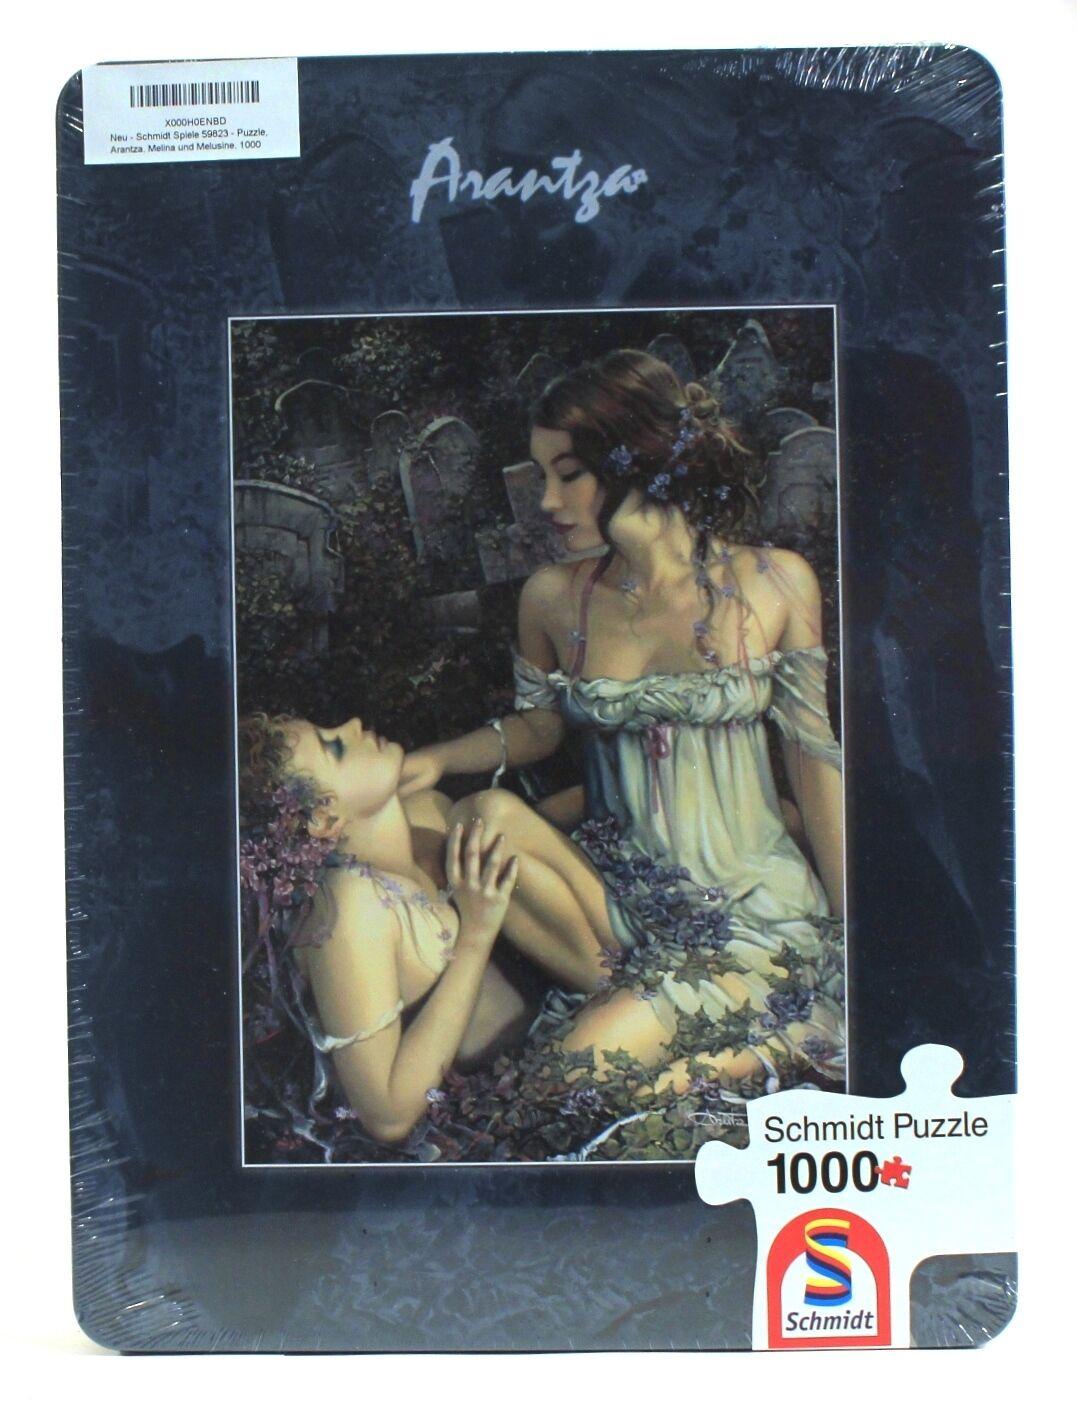 2010 Schmidt MELINA + MELUSINE Puzzle ARANTZA SESTAYO  1000 pcs METAL scatola sealed  protezione post-vendita